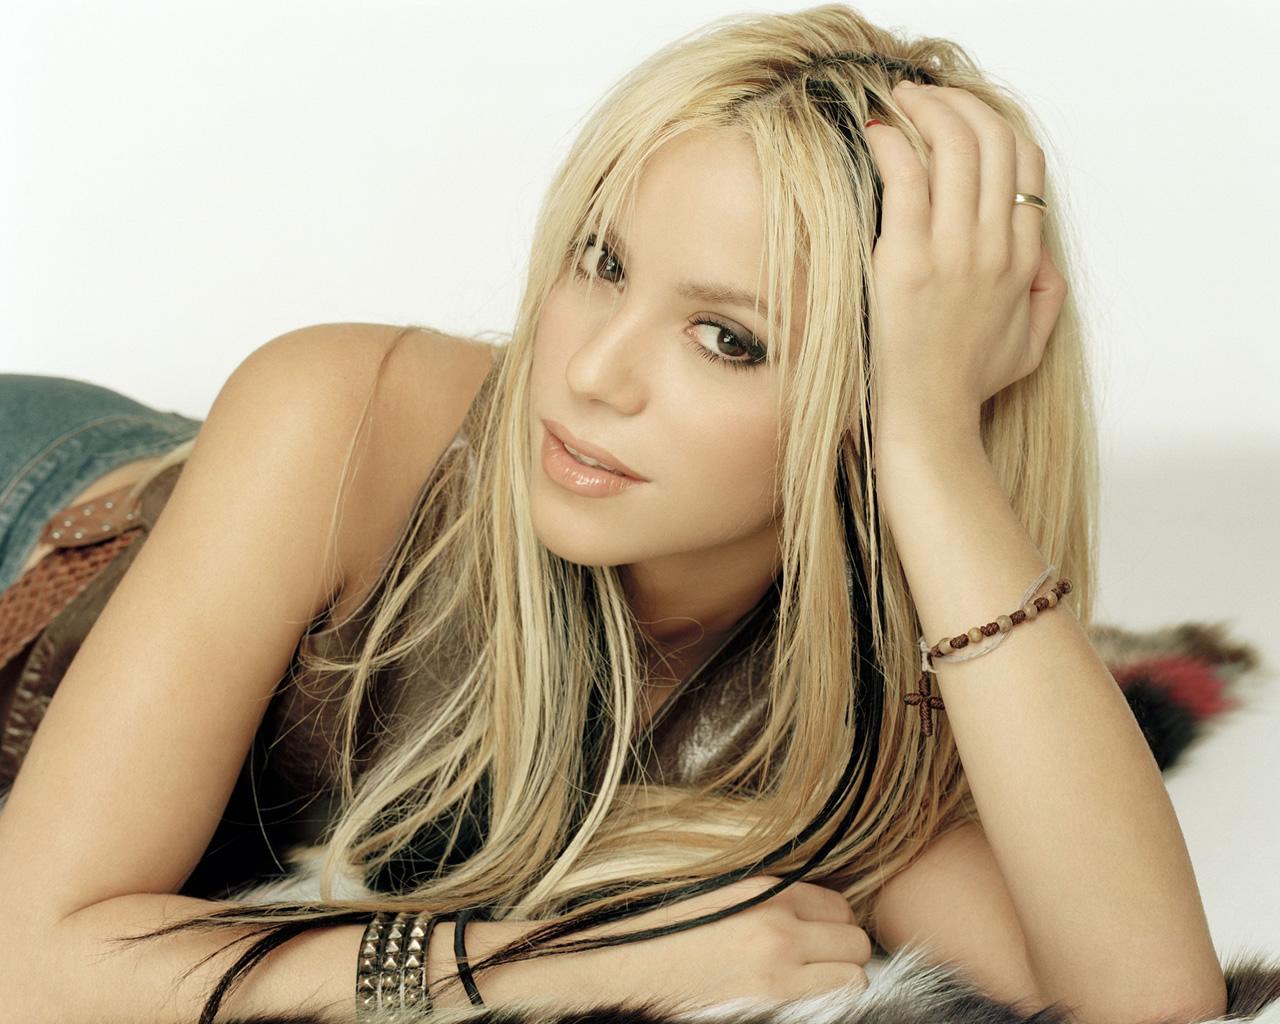 http://4.bp.blogspot.com/-Yi6QM_cF3T4/Tkc5ney976I/AAAAAAAABgo/7kHMTxIO8eQ/s1600/Shakira+%25281%2529.jpg